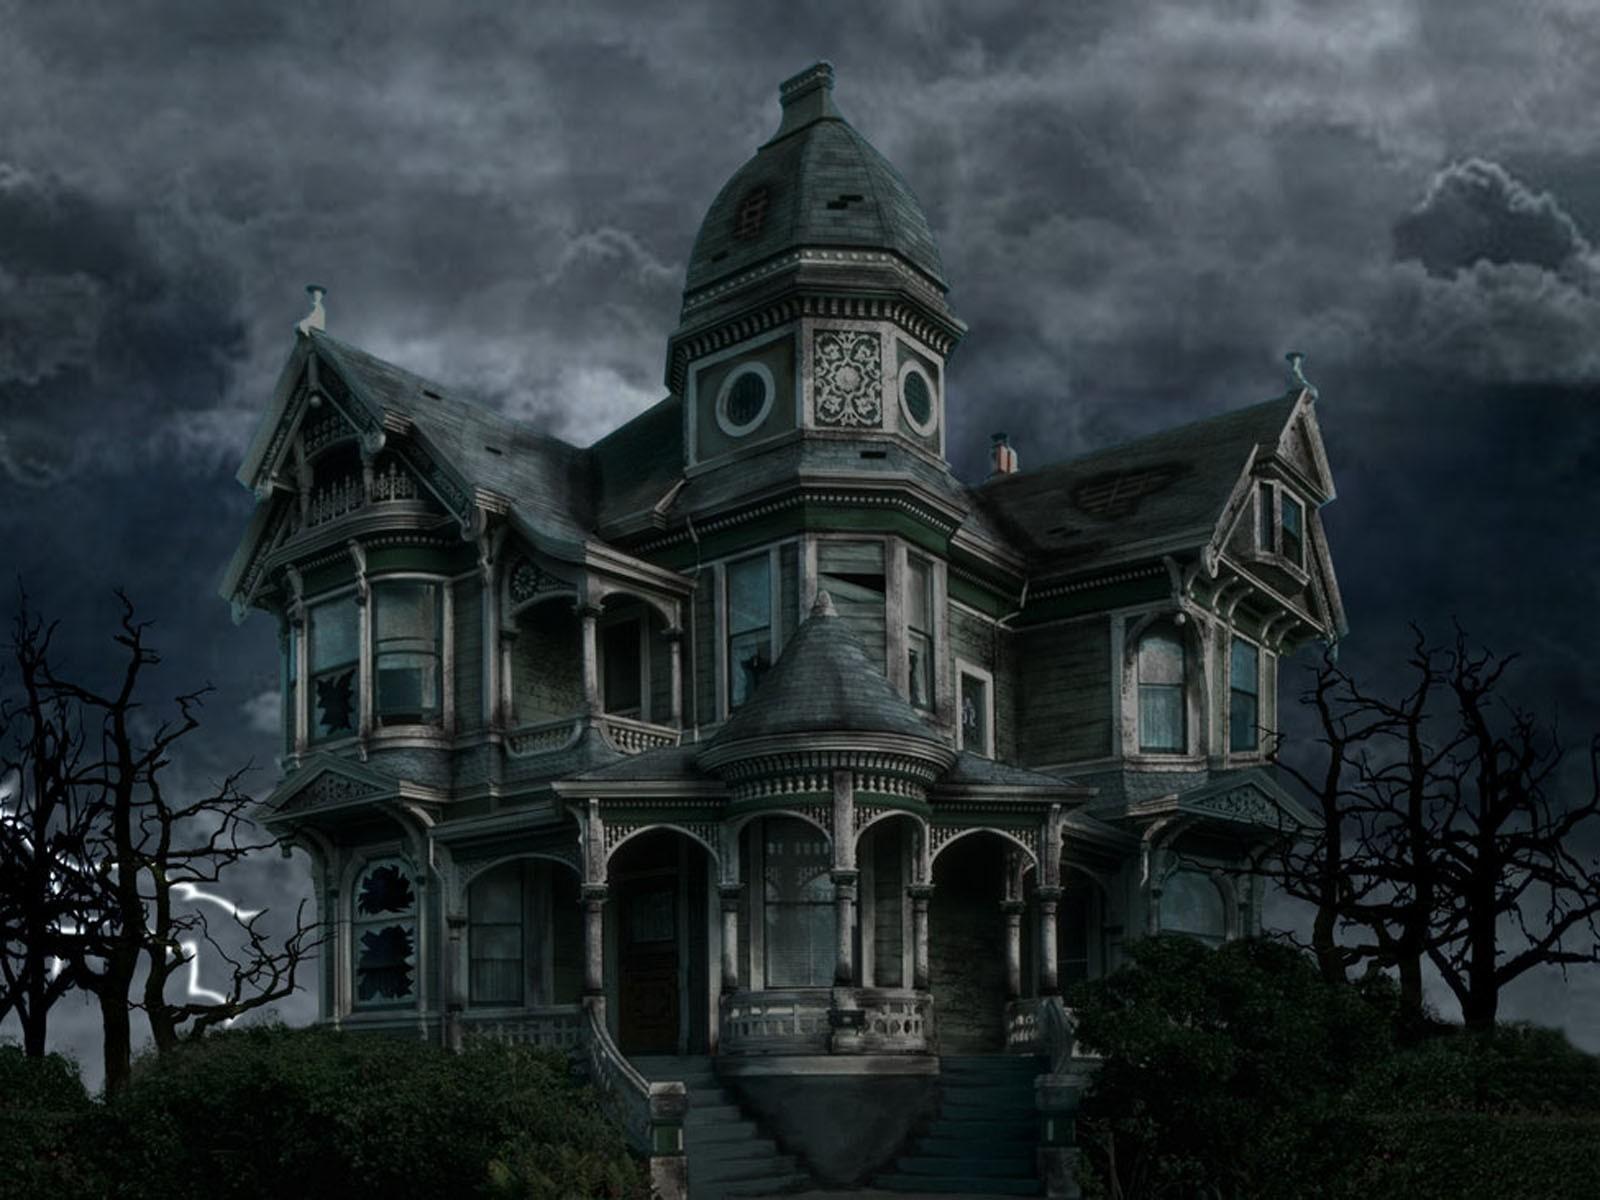 Haunted house gioco